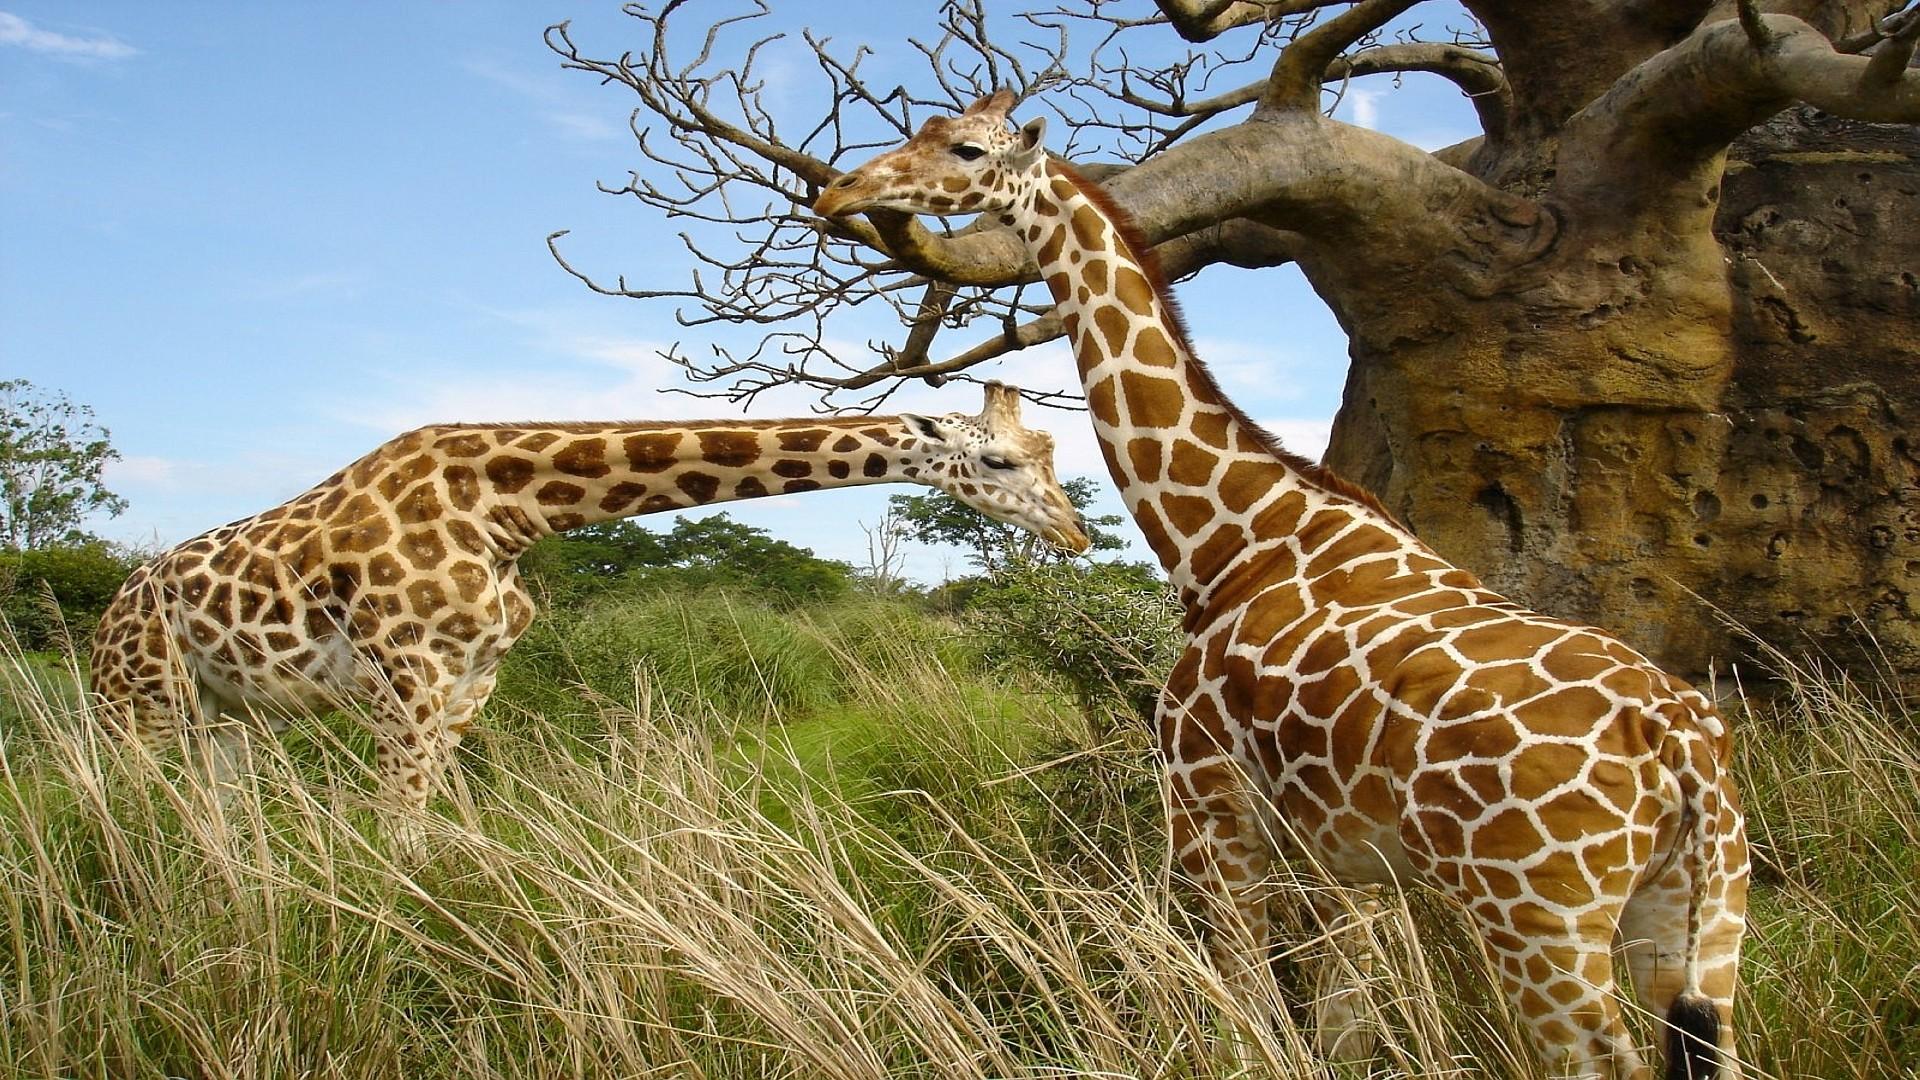 High Resolution Wallpaper Wildlife: Wildlife Desktop Wallpaper (62+ Images